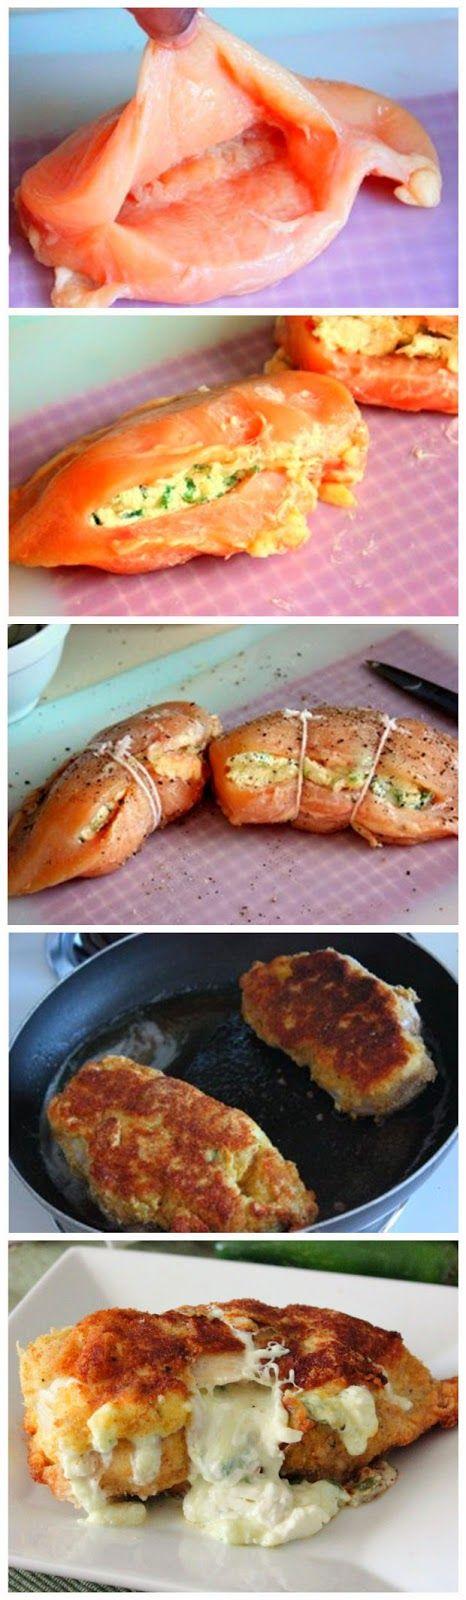 Jalapeno Popper Stuffed Chicken Breasts -  Use baking blend for breadcrumbs